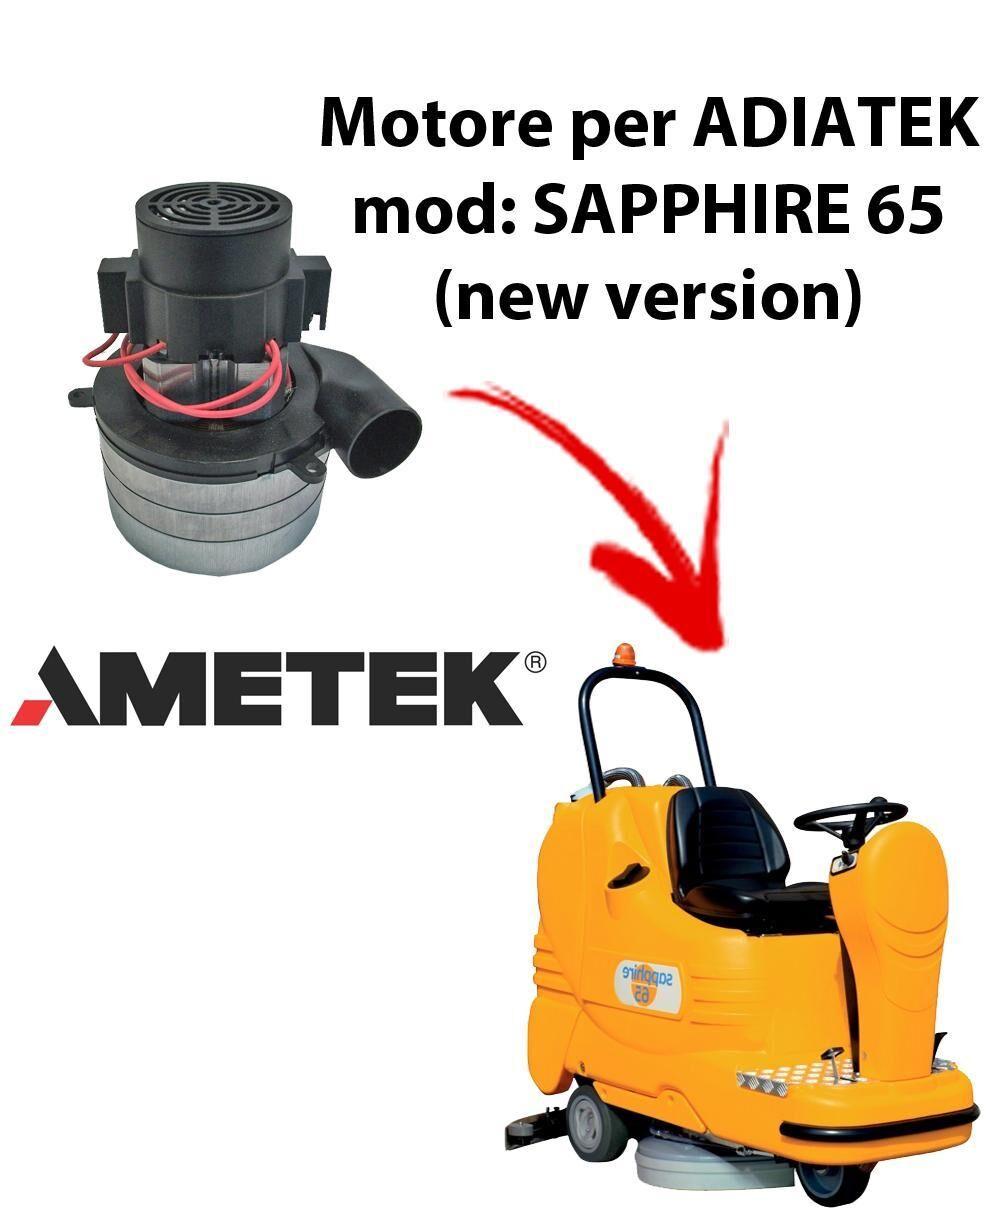 adiatek sapphire 65 (new version) motore aspirazione ametek italia per lavapavimenti